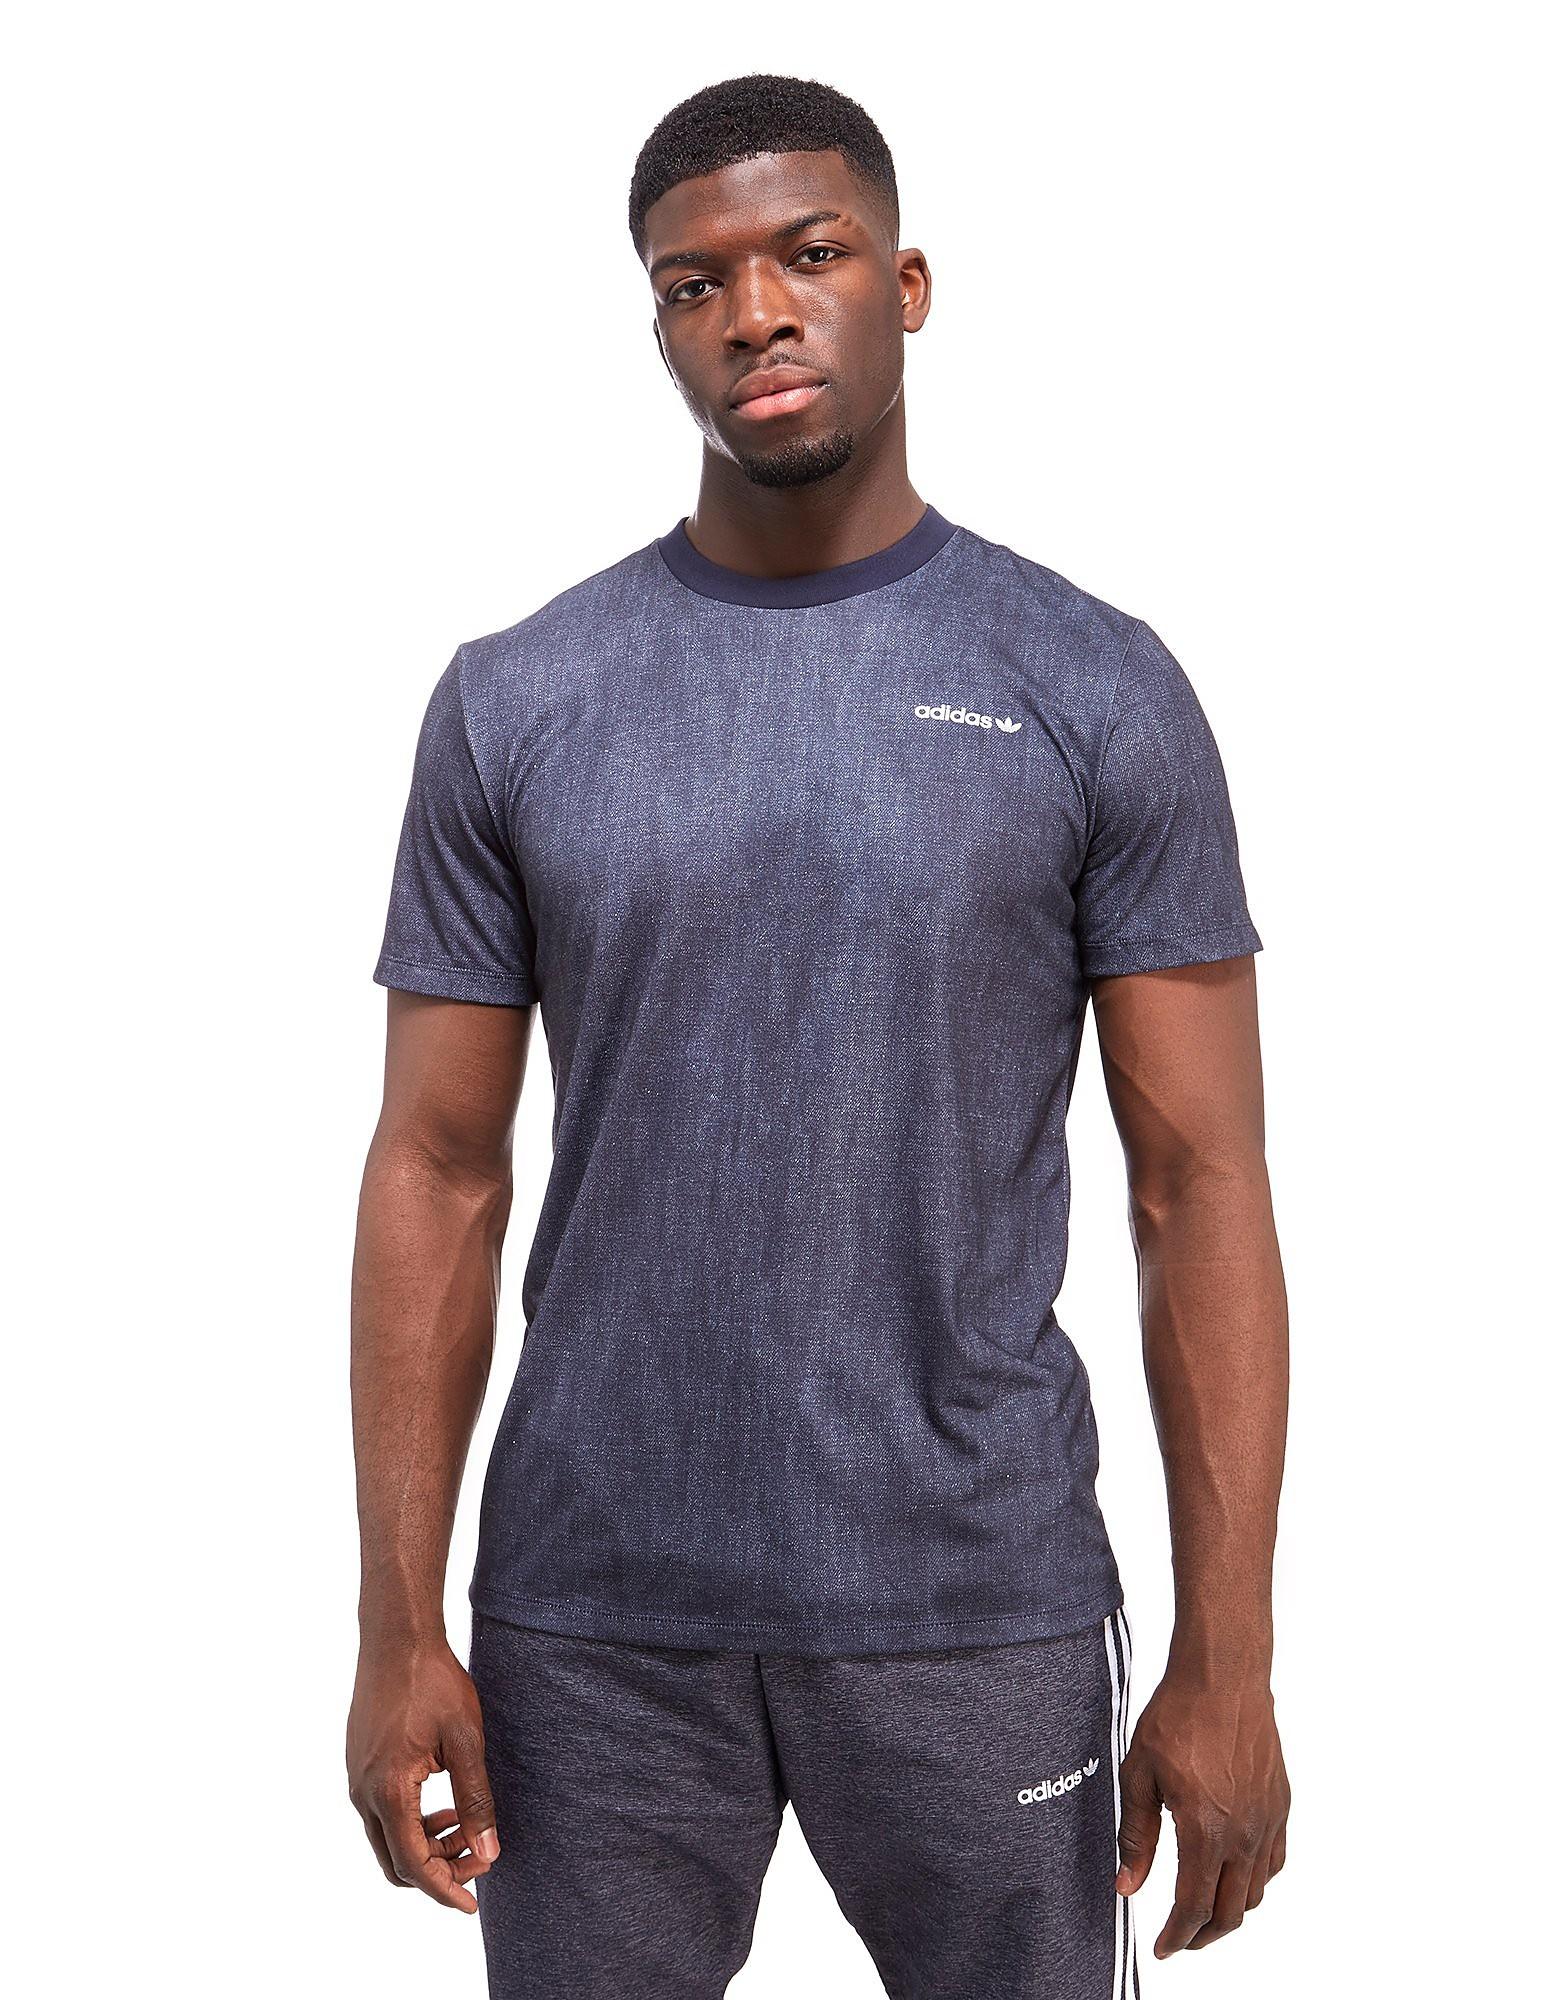 adidas Originals Tokyo T-Shirt